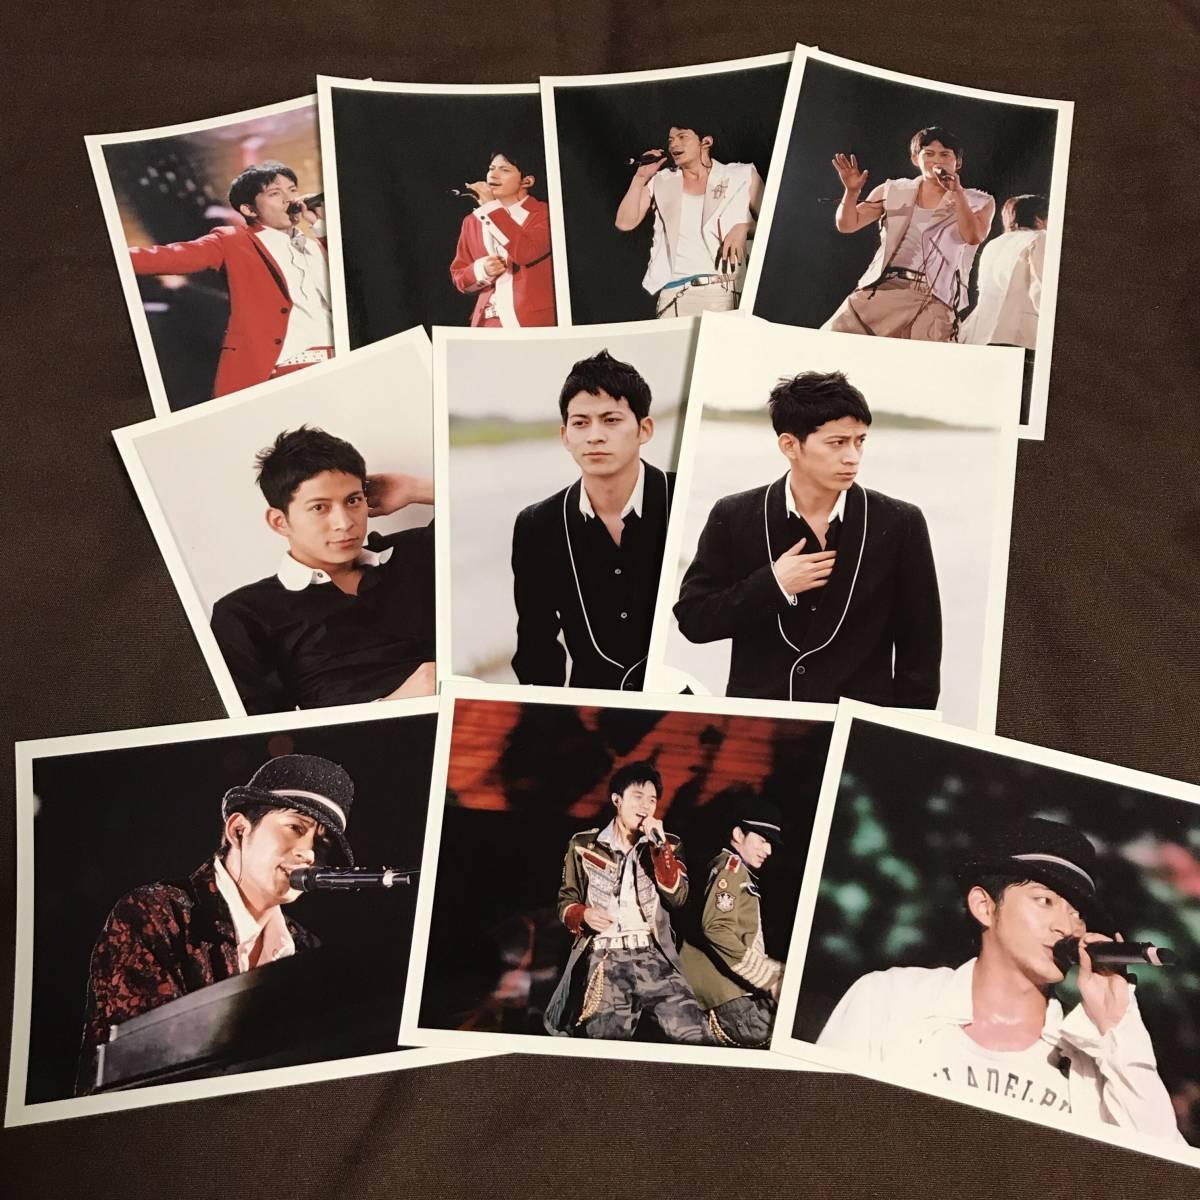 V6 岡田准一 公式写真 写真 ブロマイド グッズ ③ コンサートグッズの画像